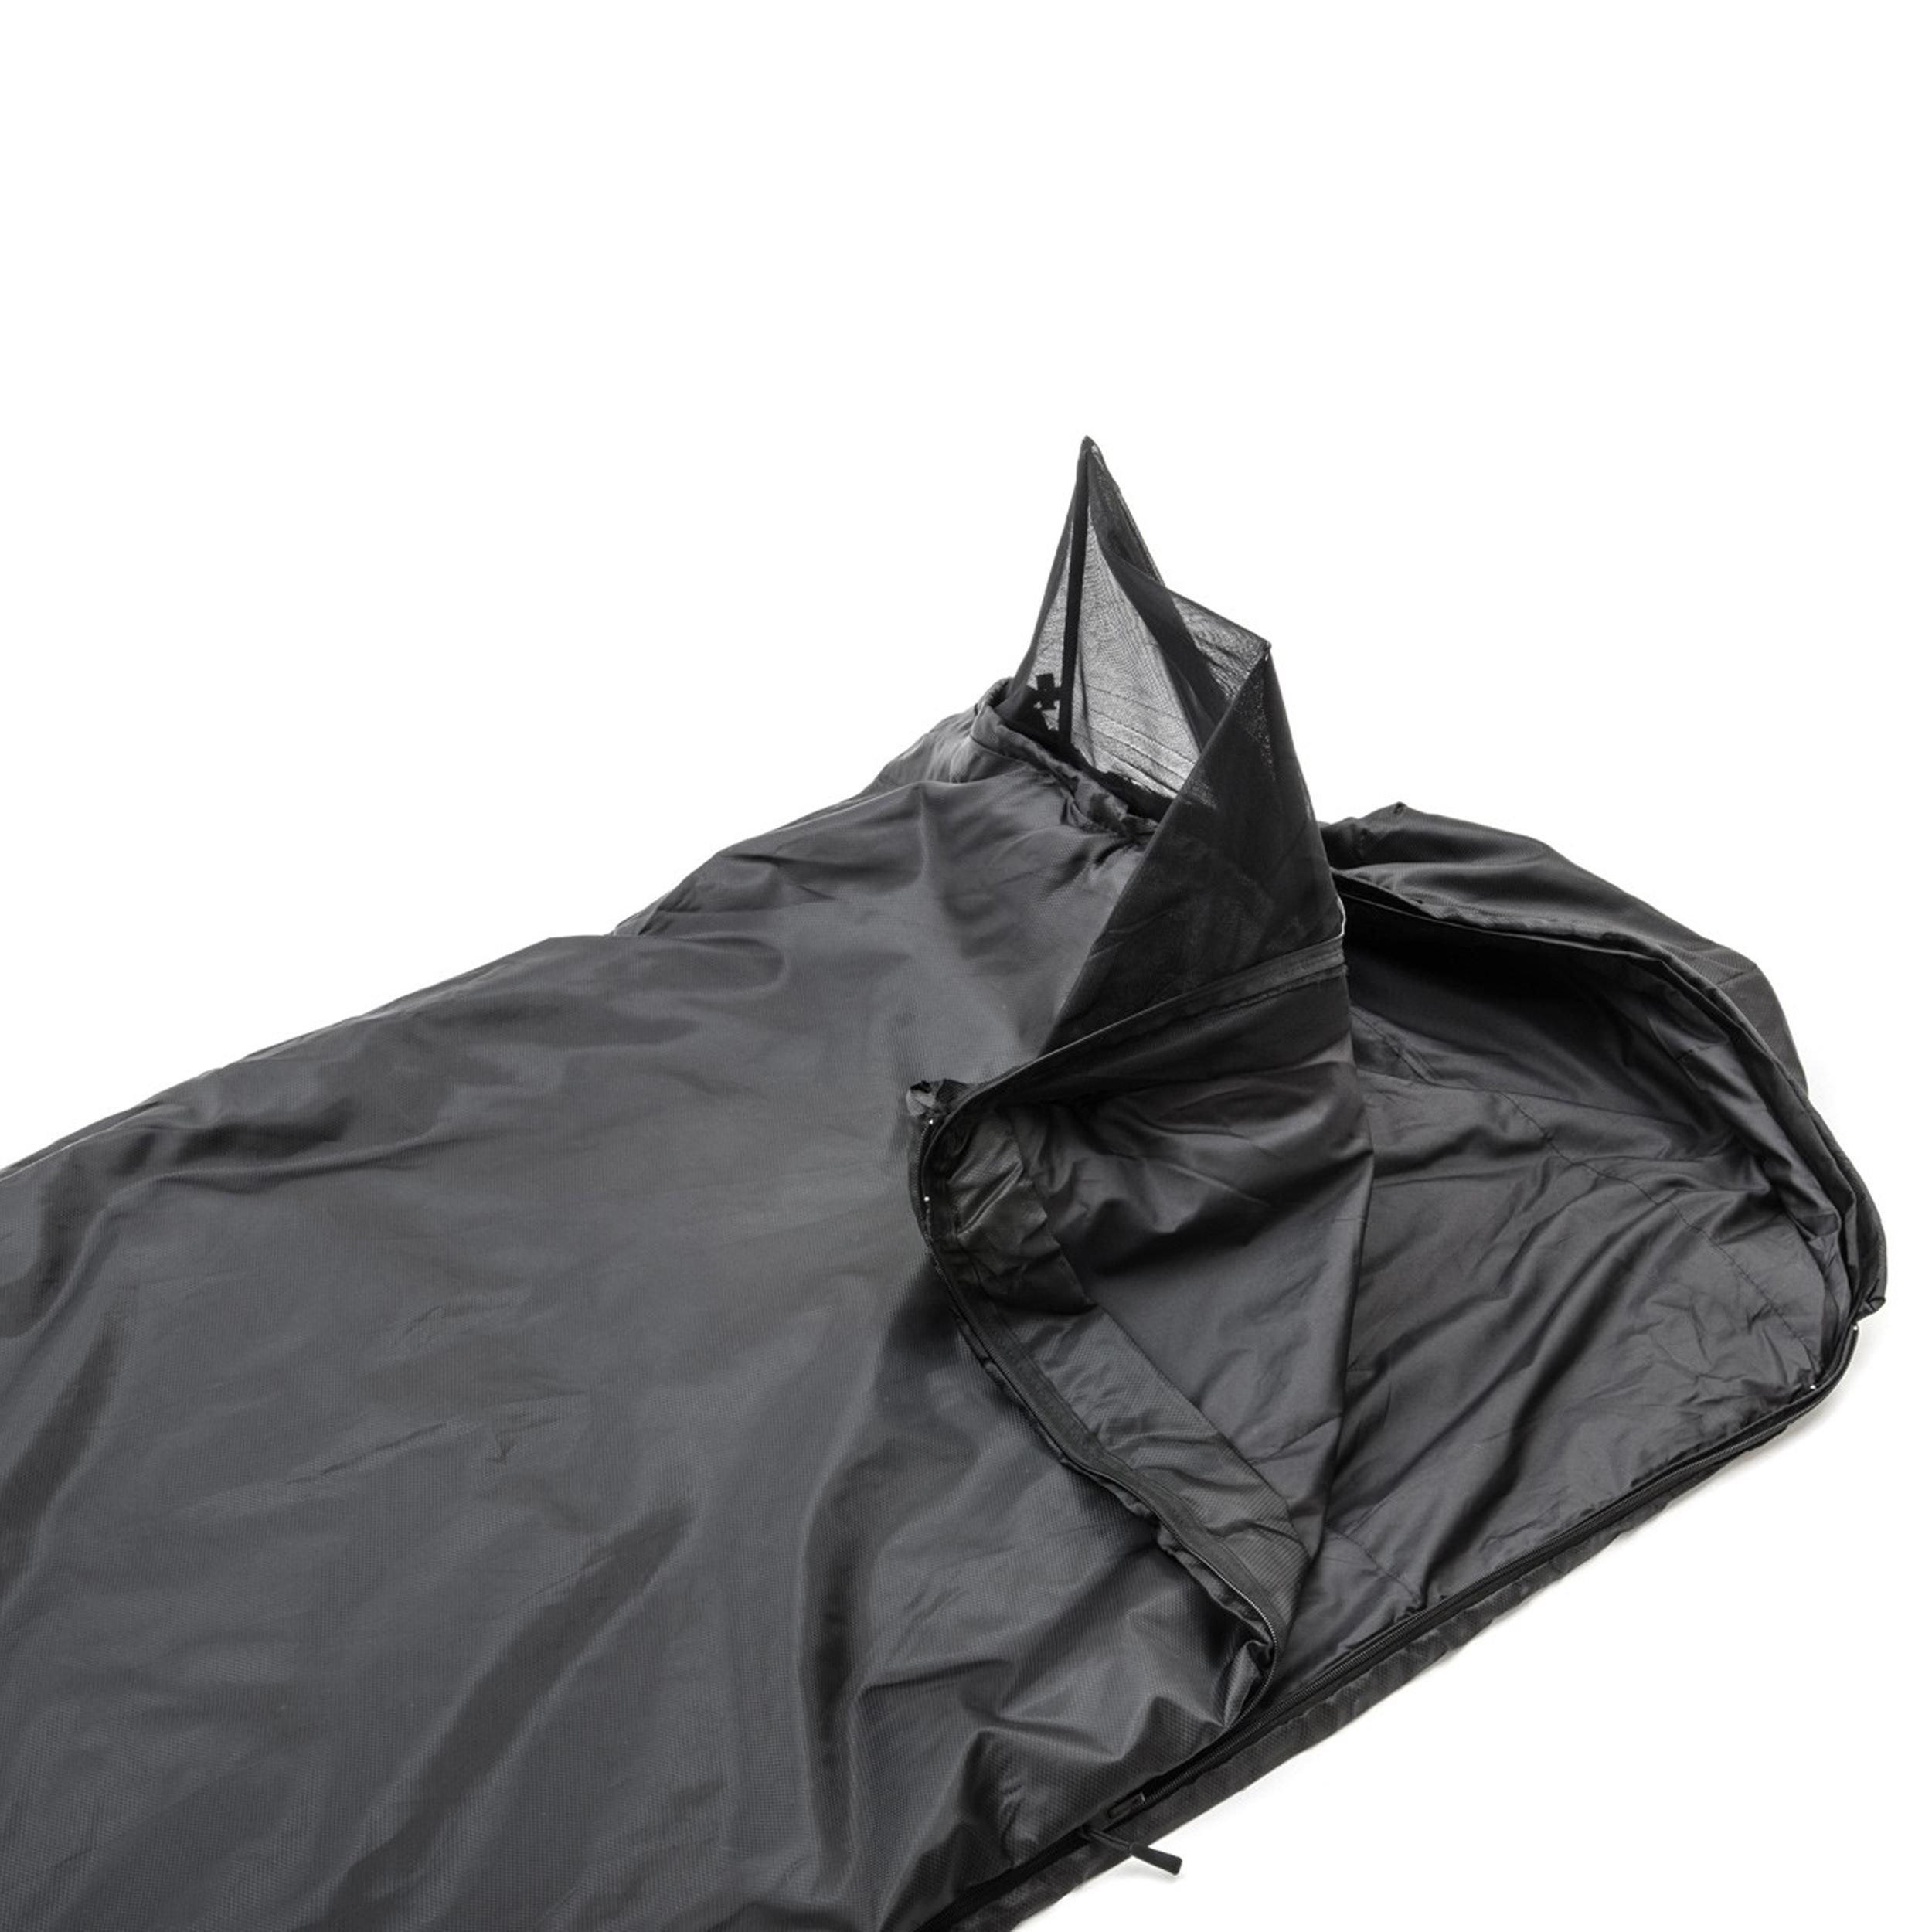 Snugpak Jungle bag Sleeping Bag Ideal For the Tropics Roll Up Mosquito Net